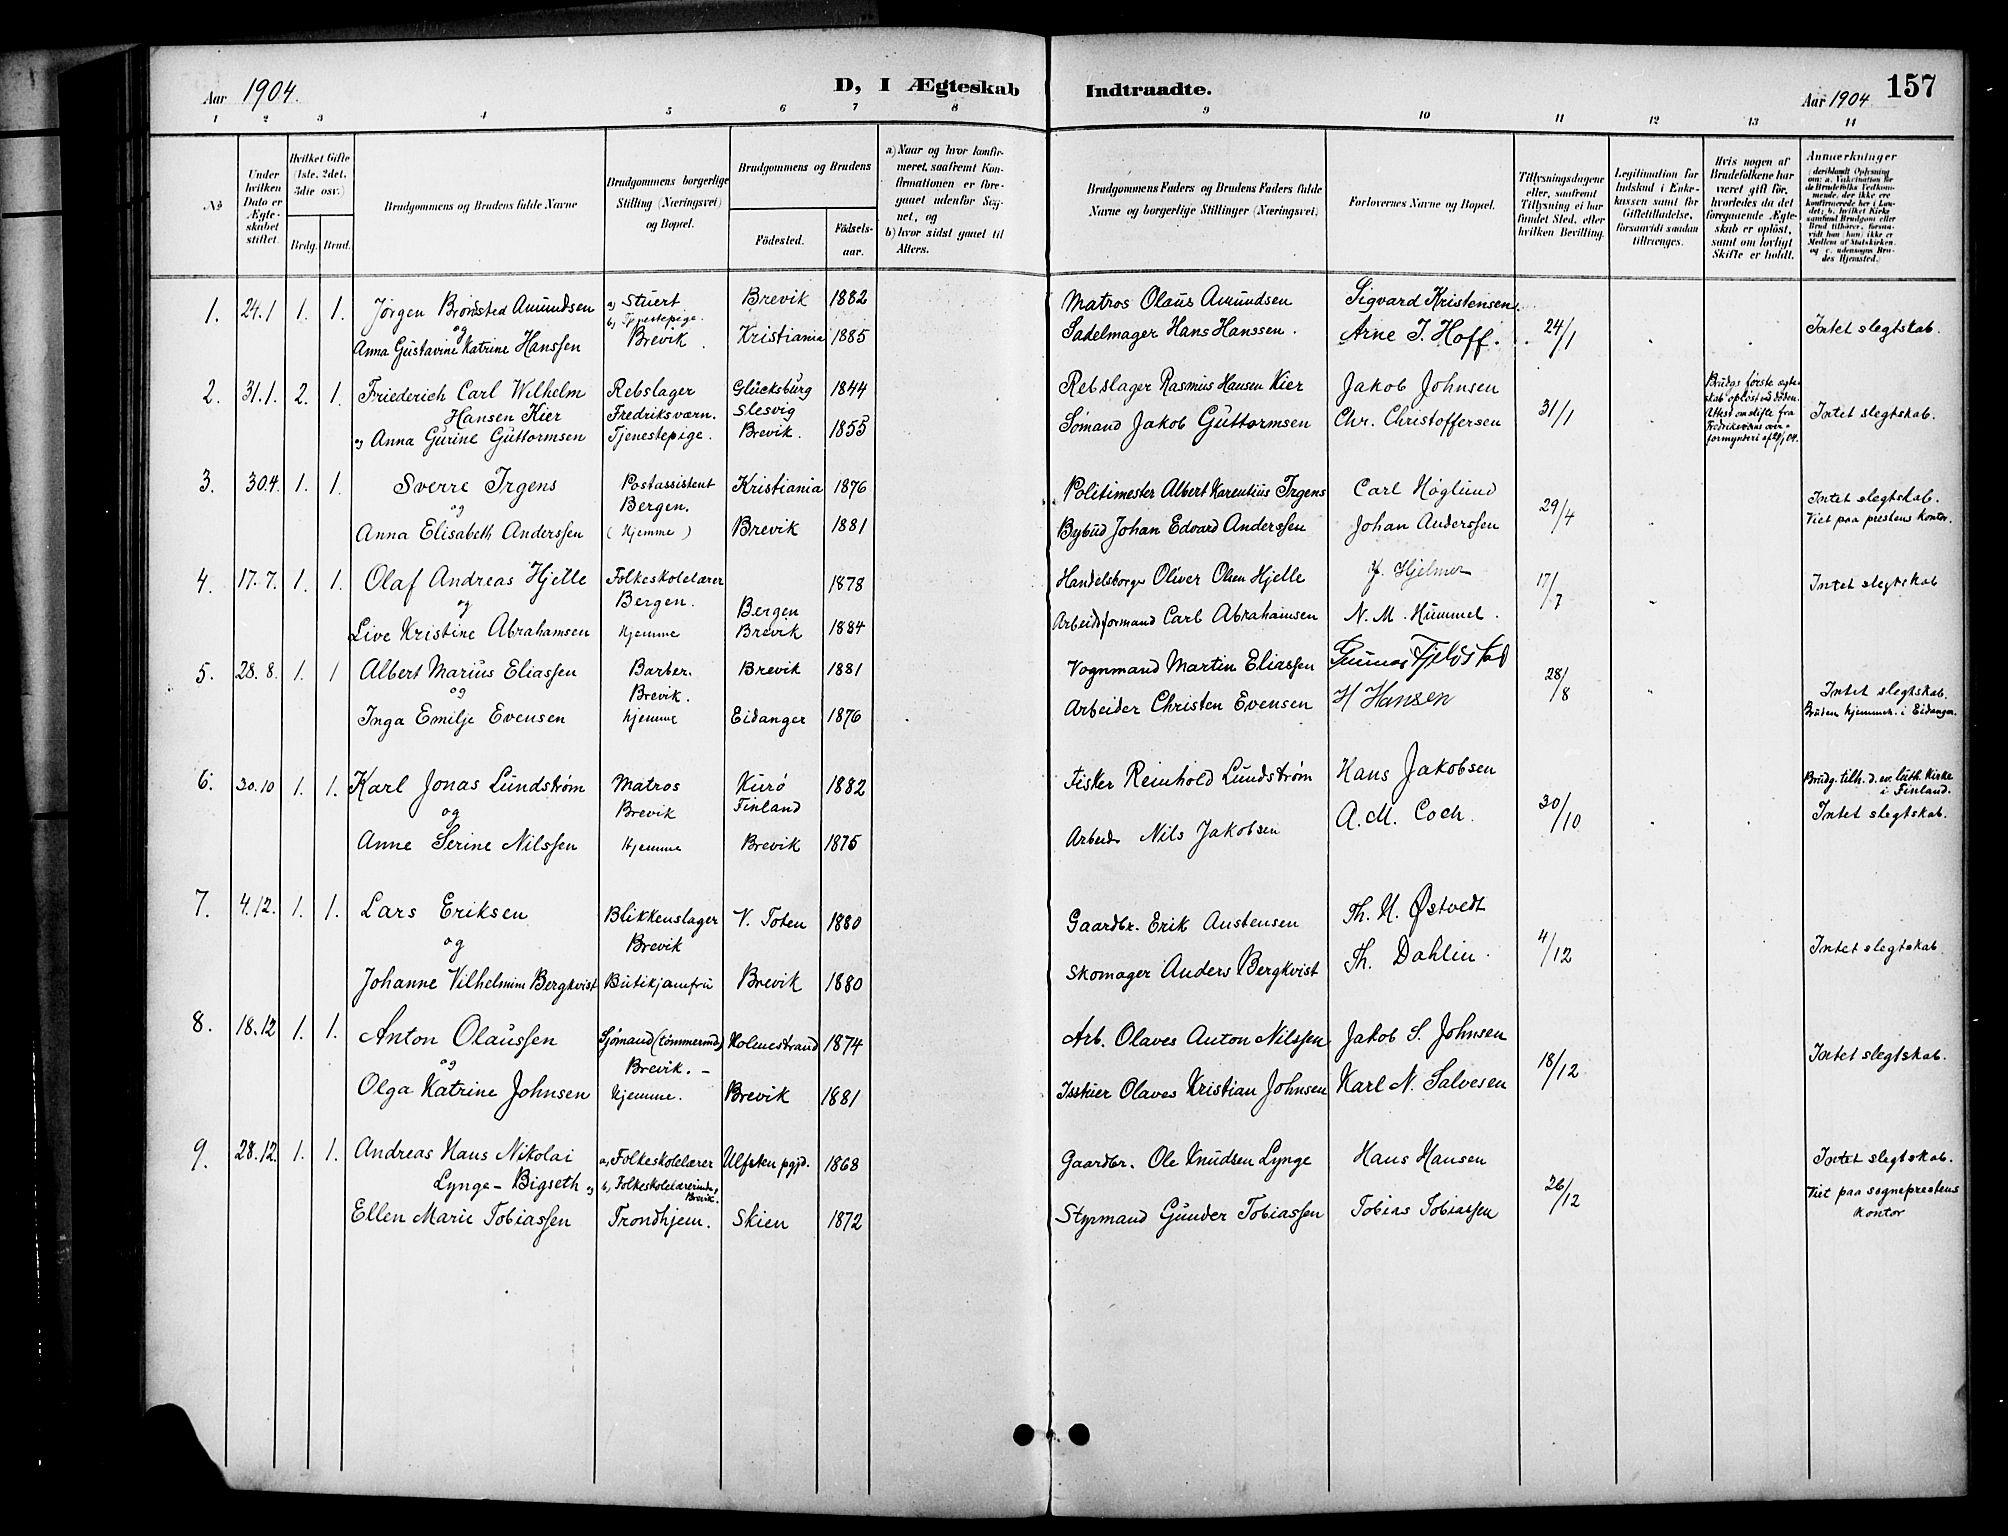 SAKO, Brevik kirkebøker, G/Ga/L0005: Klokkerbok nr. 5, 1901-1924, s. 157